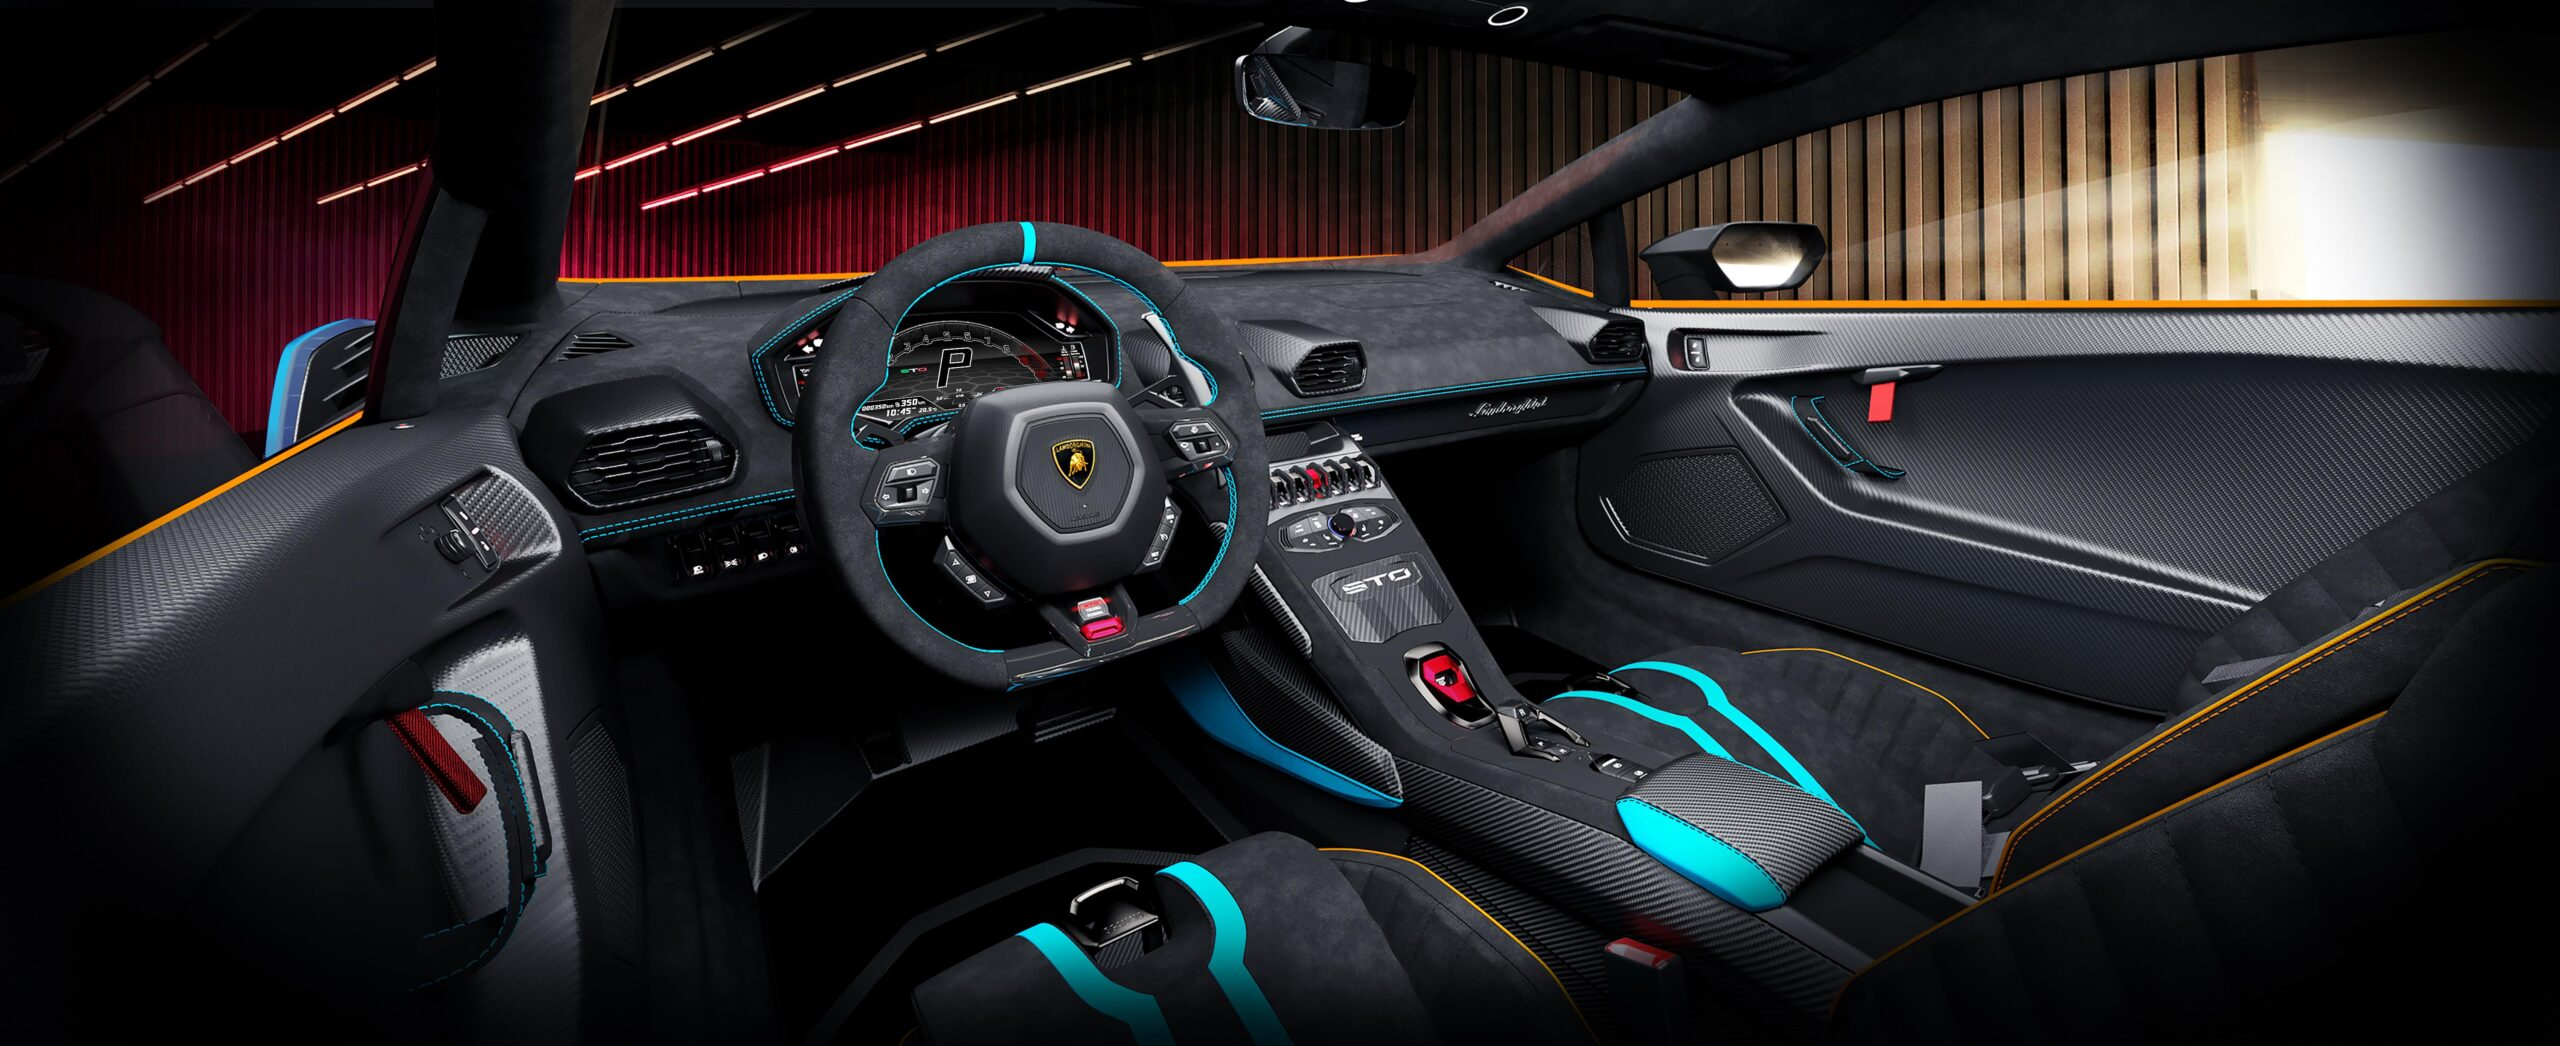 Lamborghini Huracan STO Interni 1